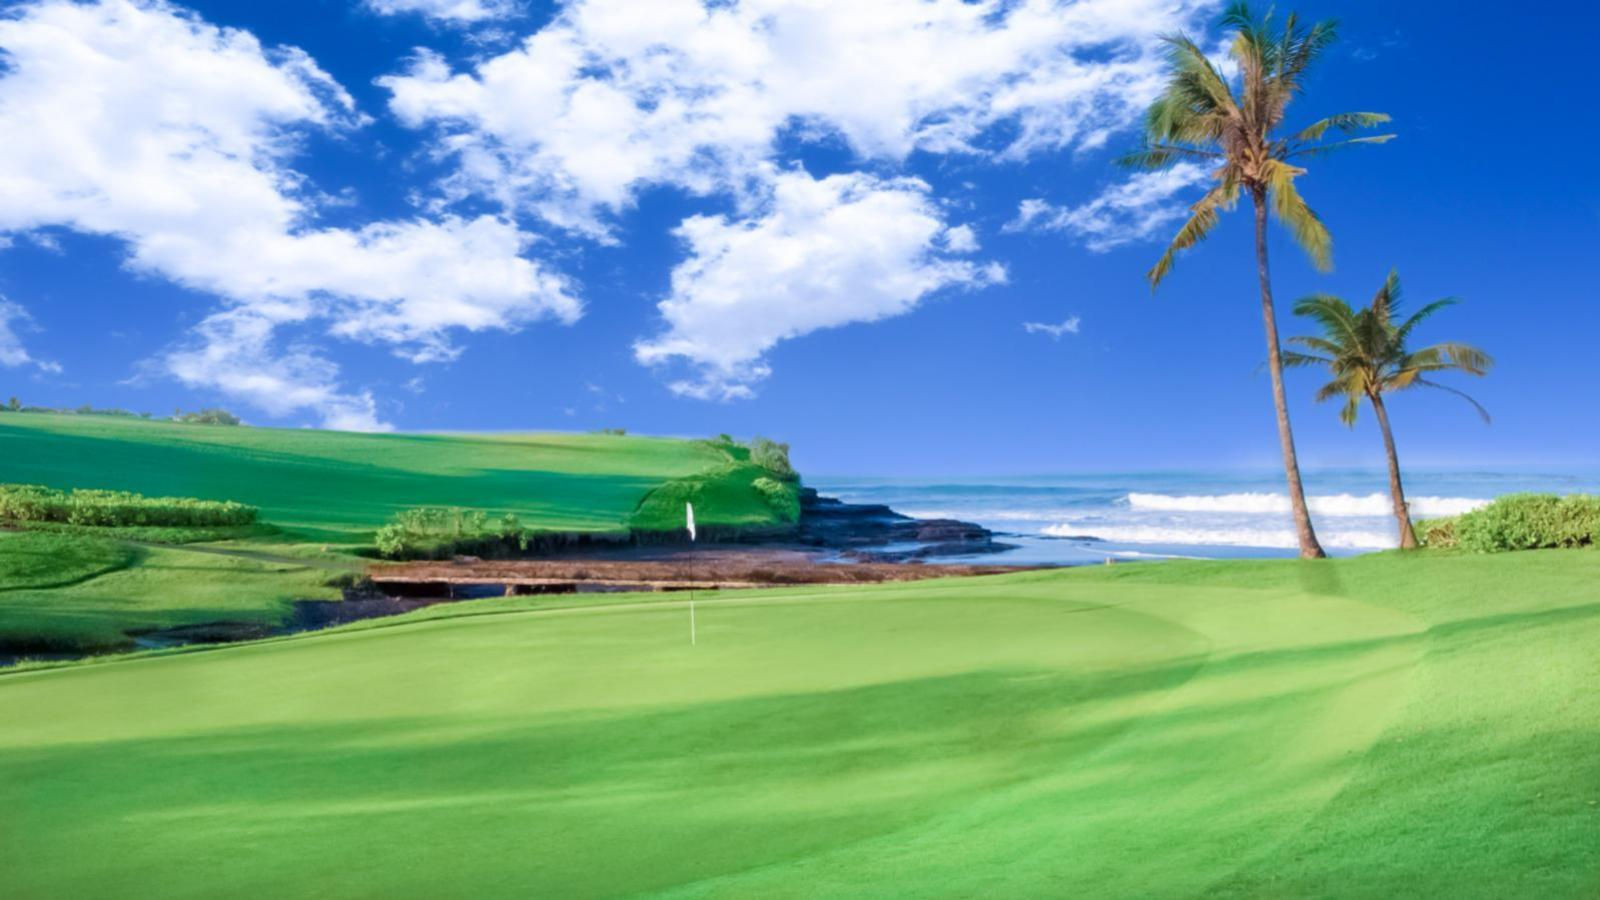 Nirwana Bali Golf Club Book Golf Online Golfscape